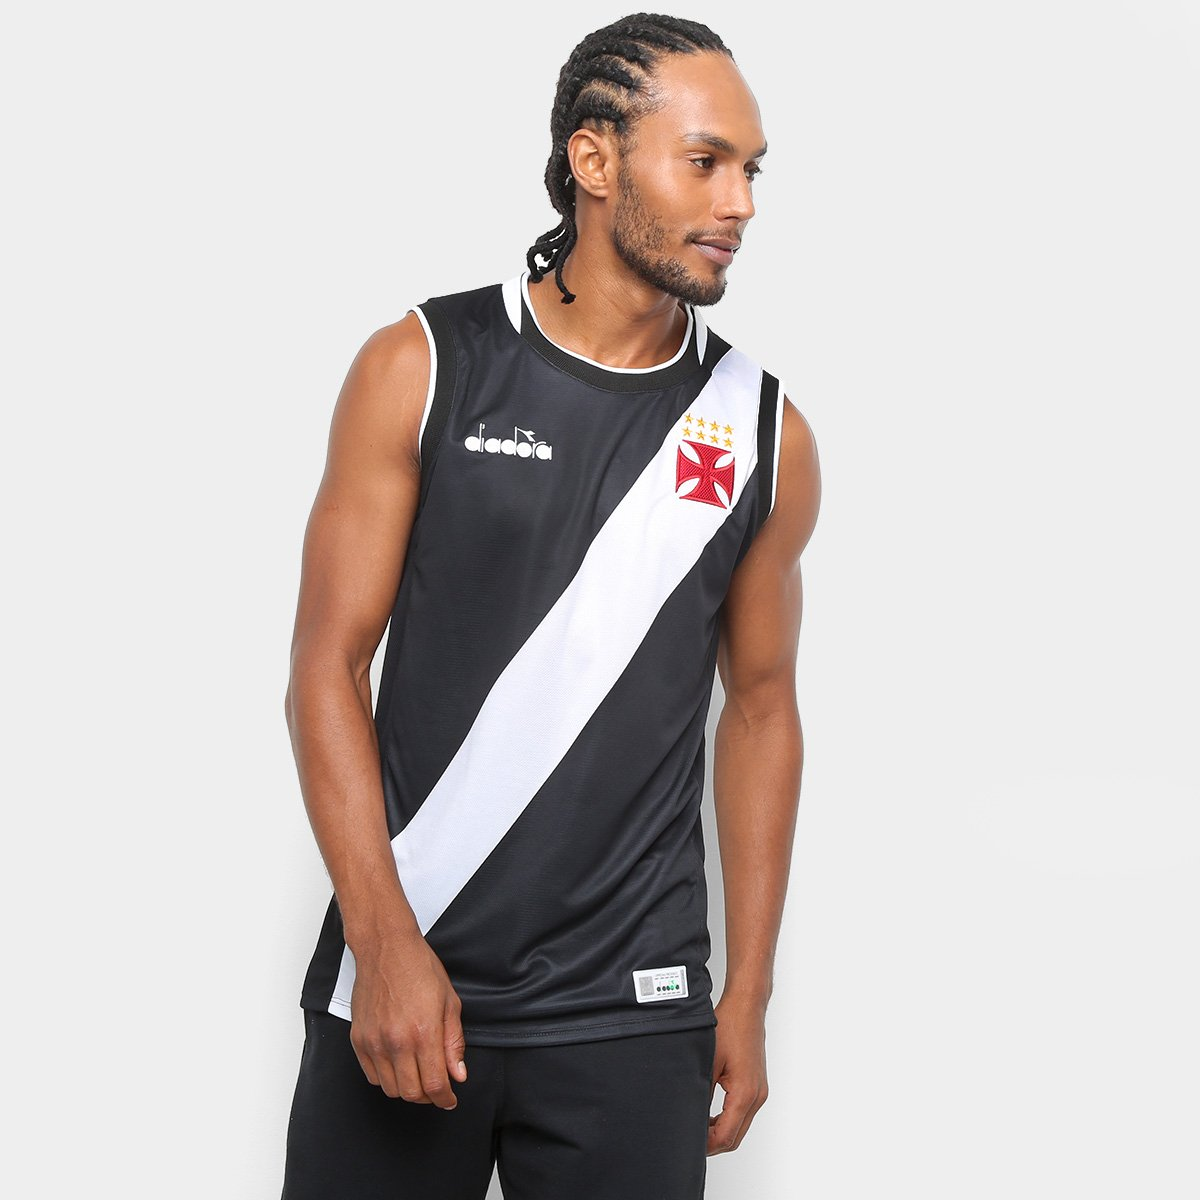 370244bbe4 Camiseta Regata Vasco I Basquete Diadora 2018 Masculina - Compre ...